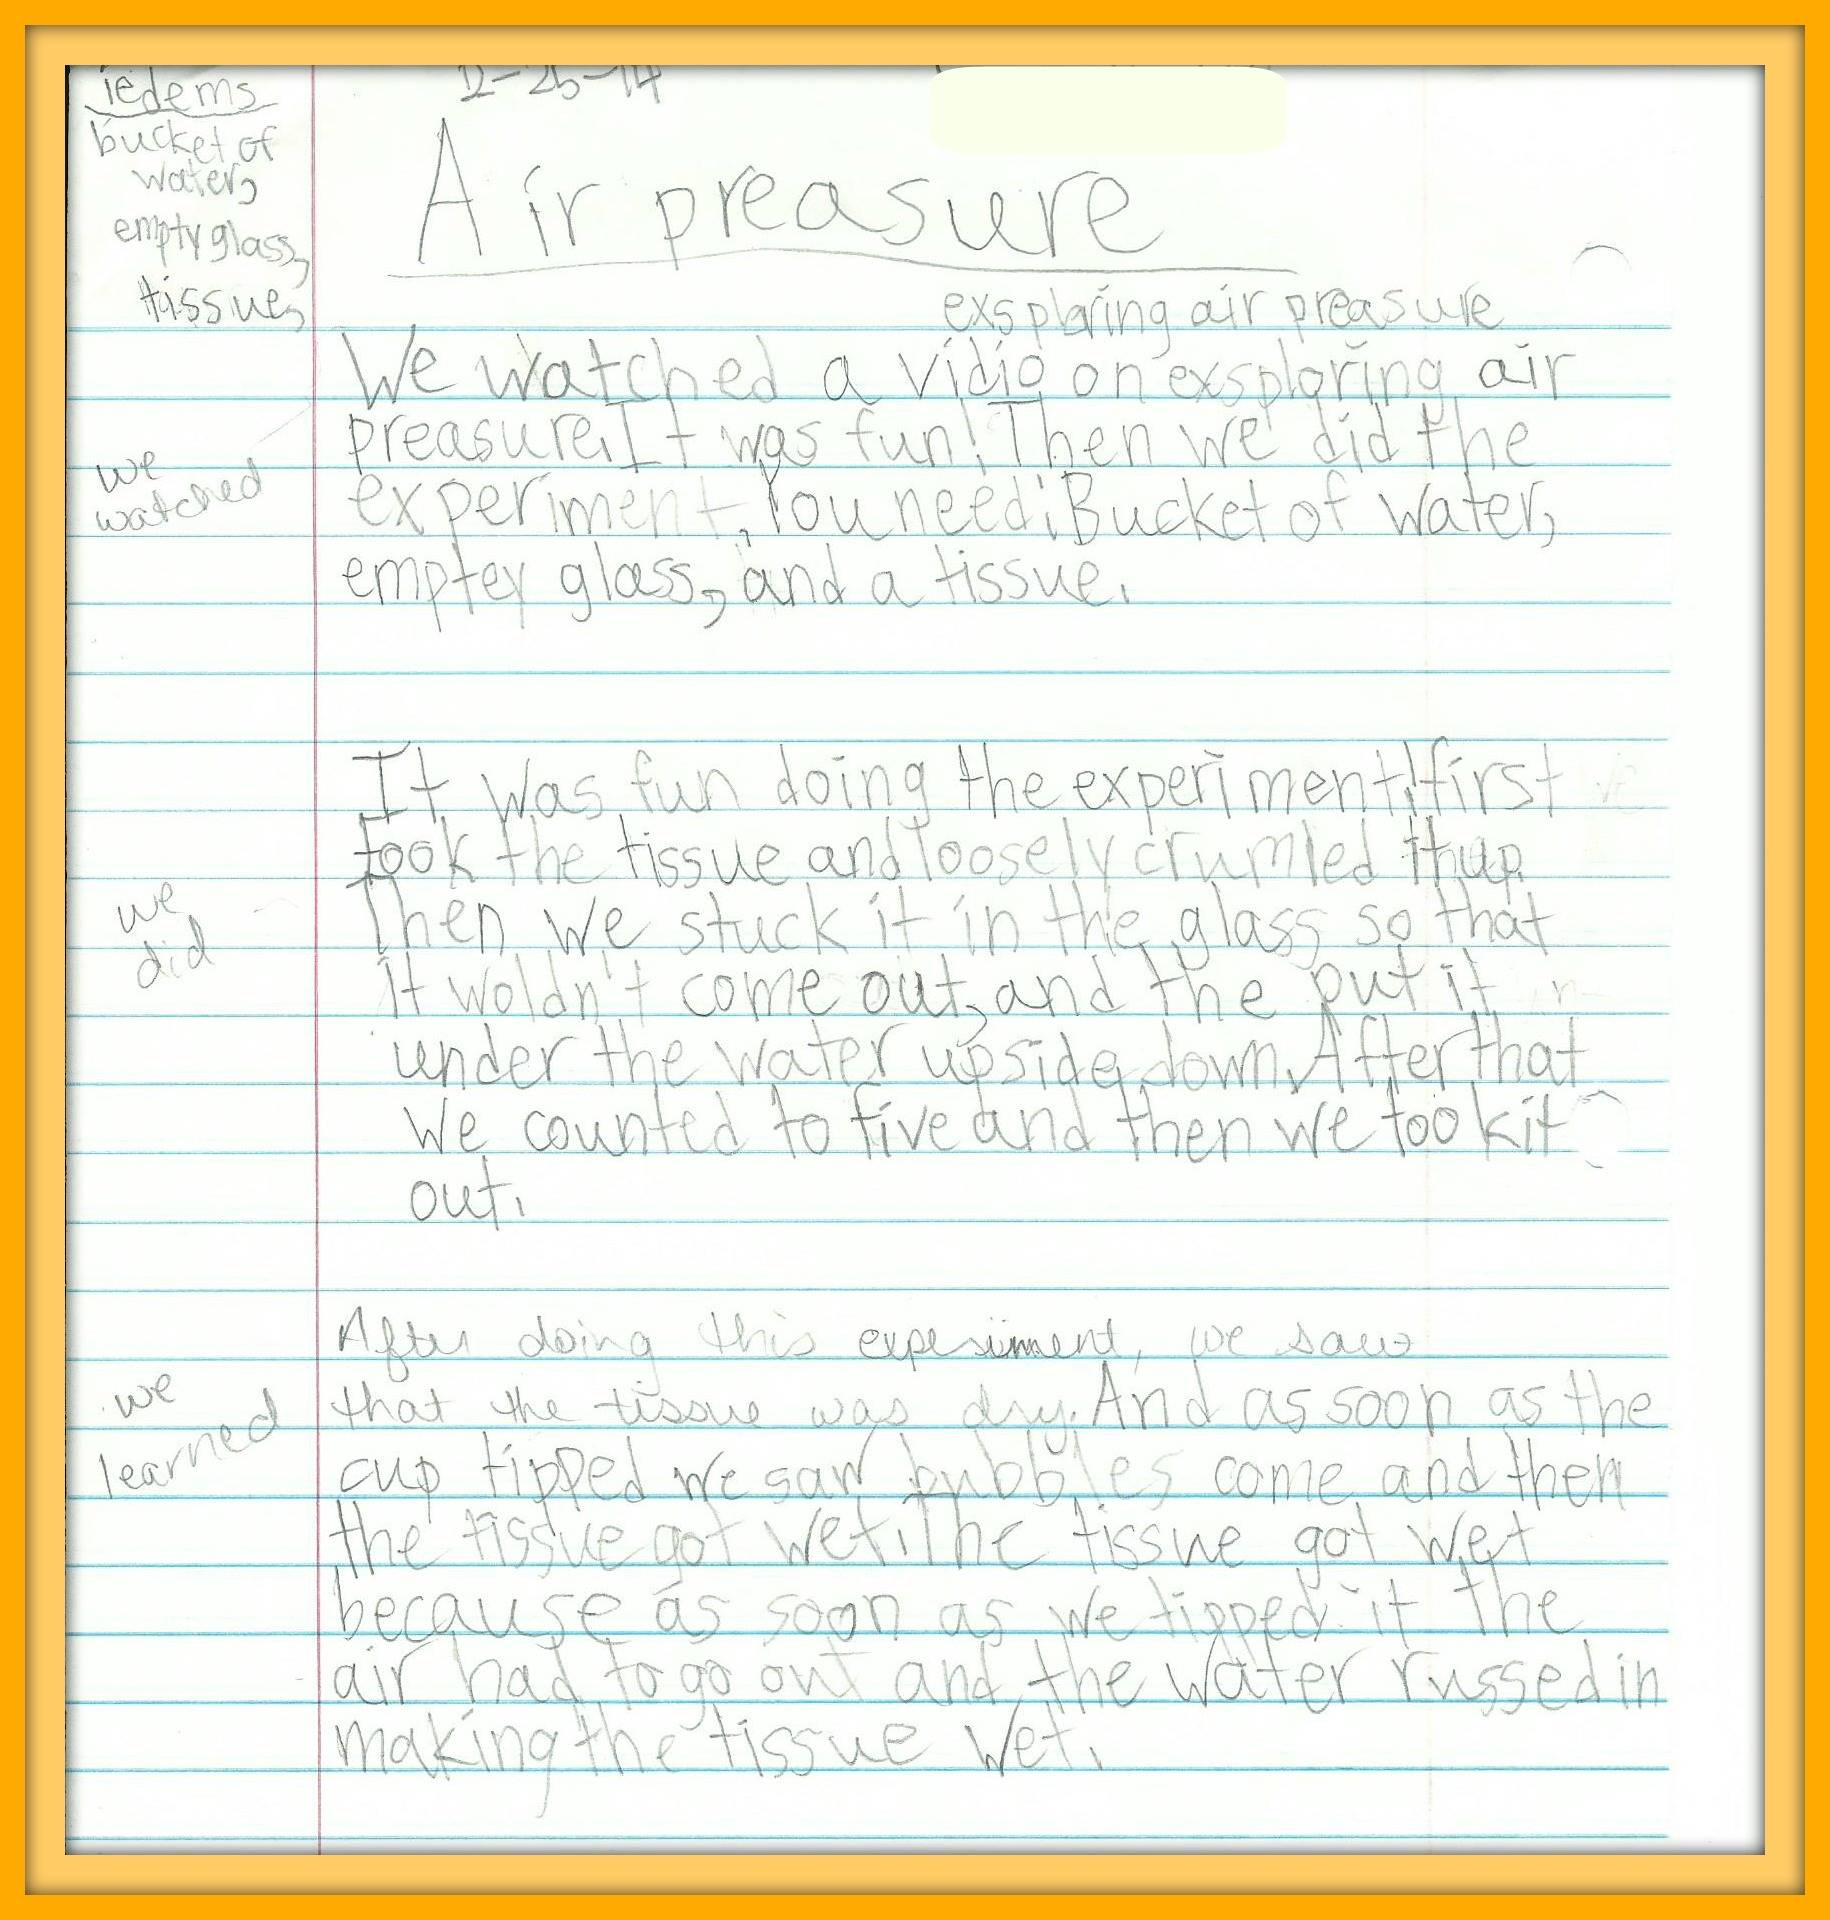 Professional Resume Writing Services Albany Ny